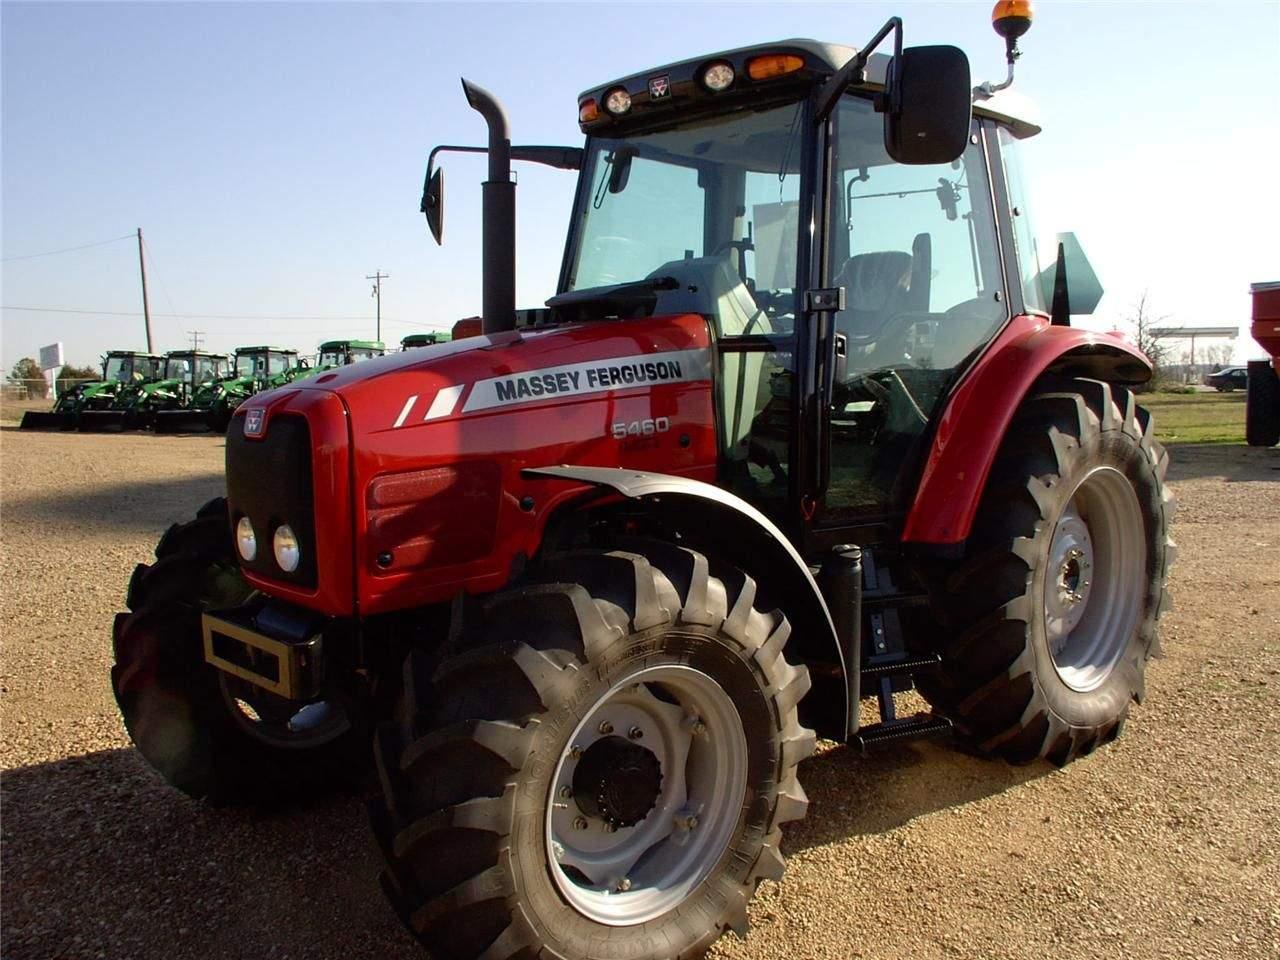 avis mf 5460 de la marque massey ferguson tracteurs agricoles. Black Bedroom Furniture Sets. Home Design Ideas